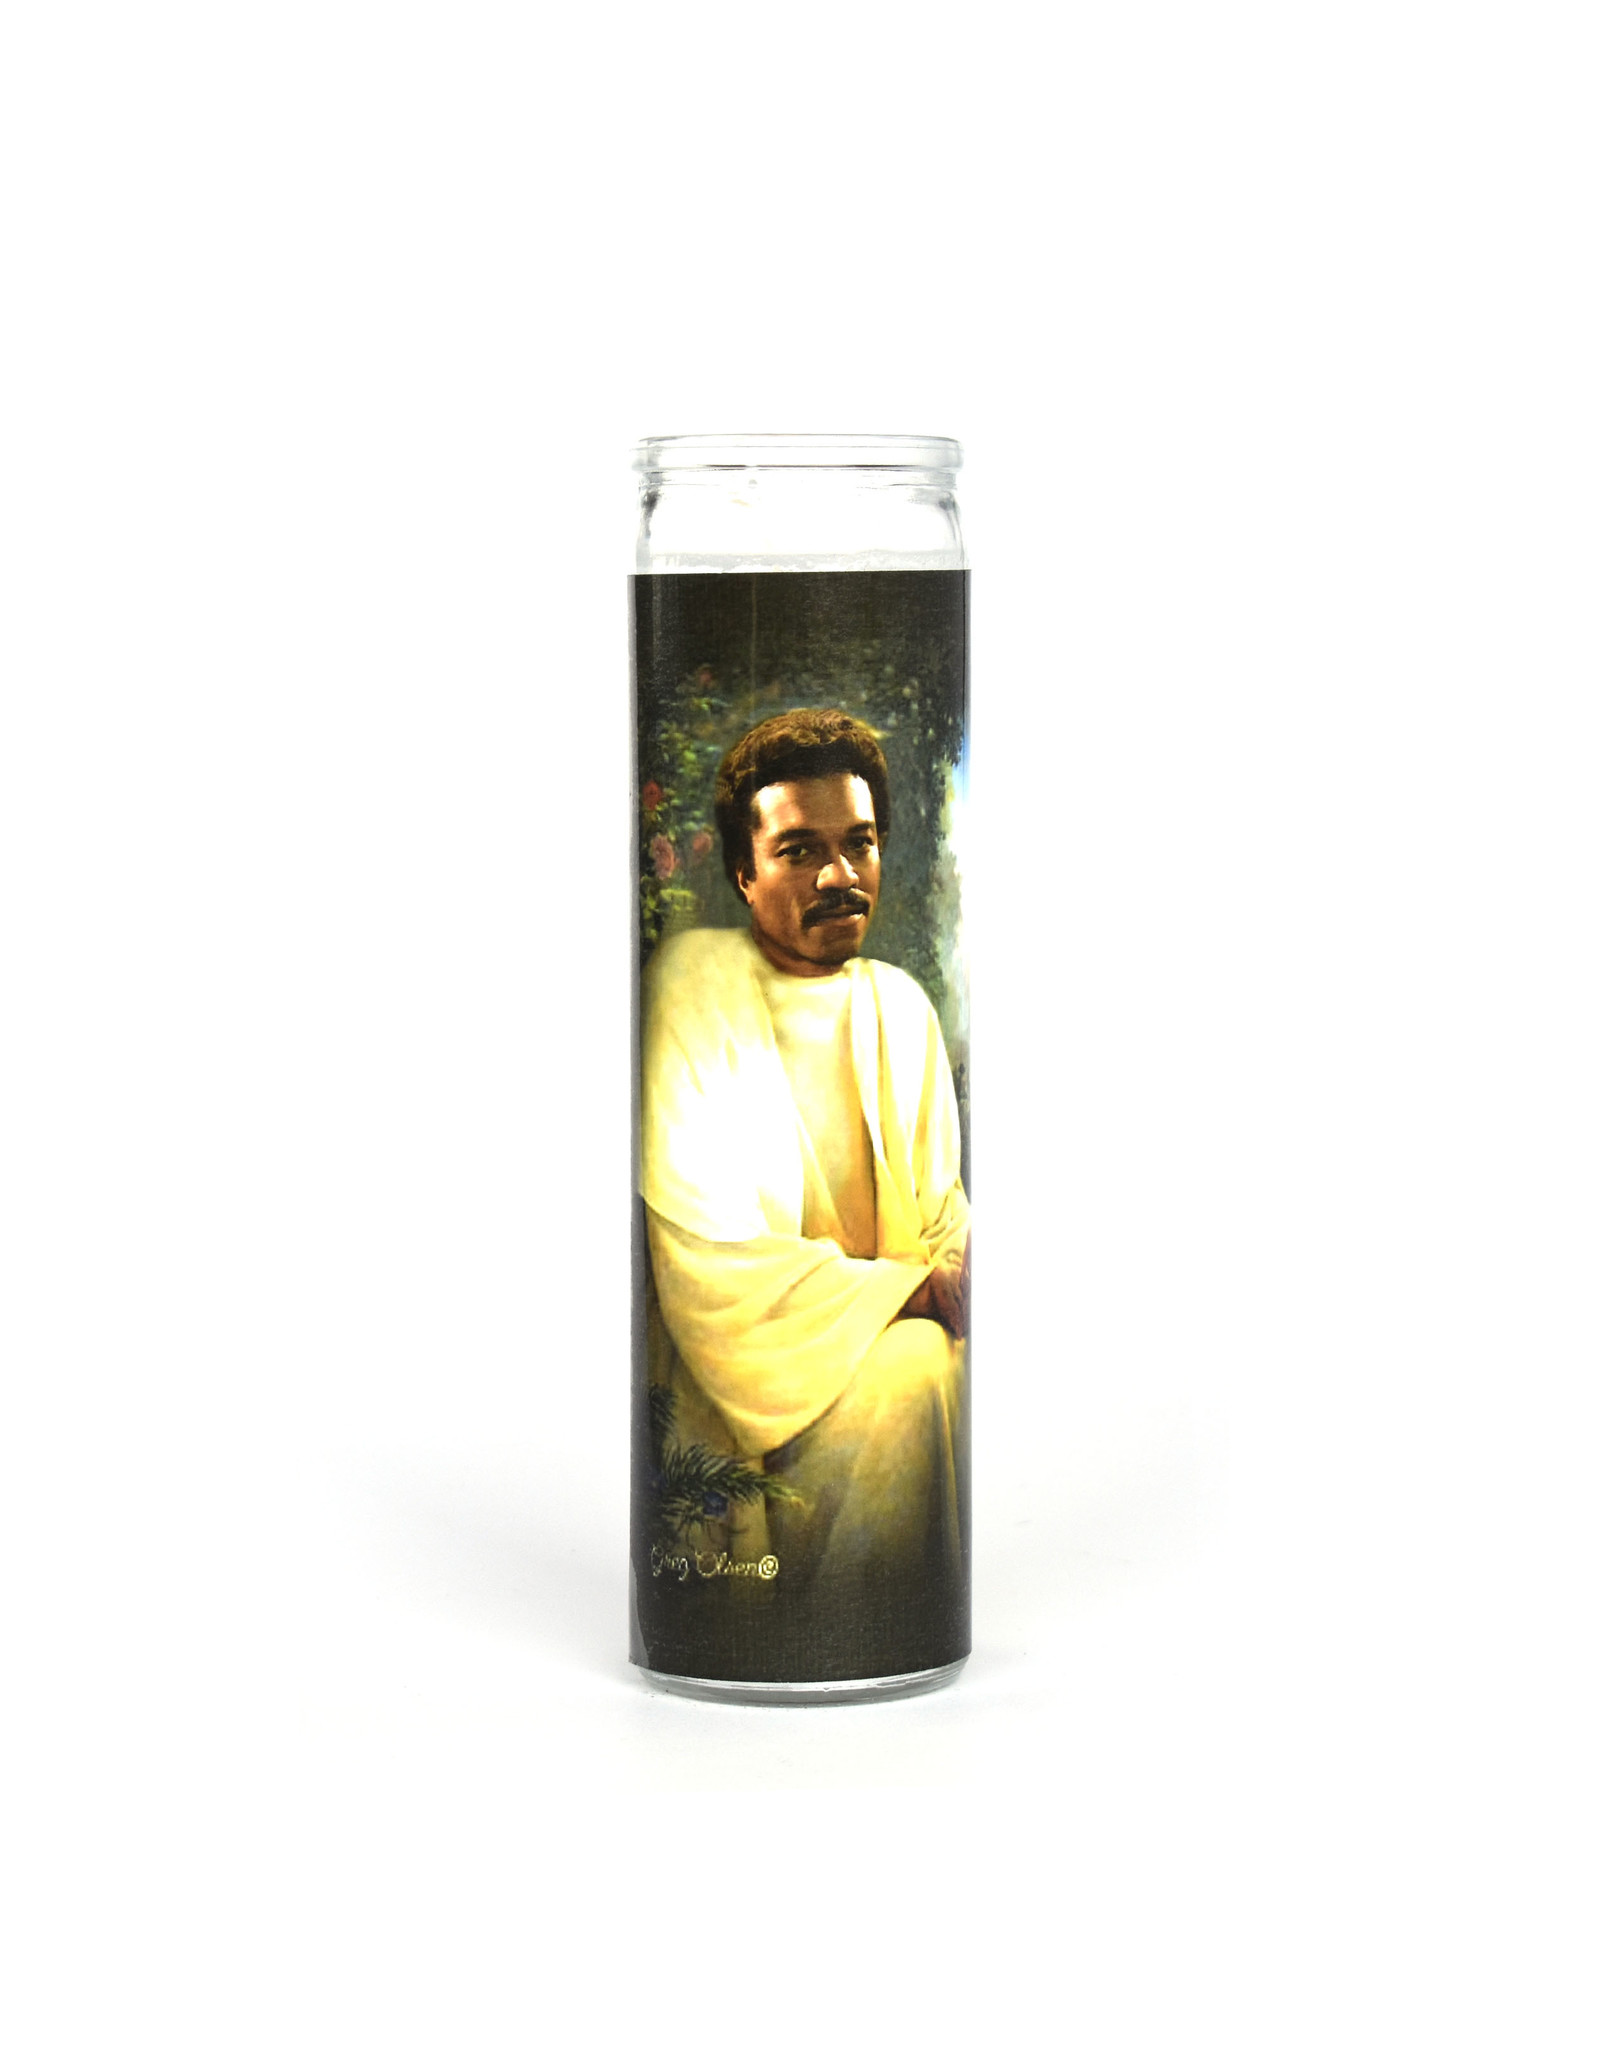 St. Lando Calrissian (Star Wars) Prayer Candle